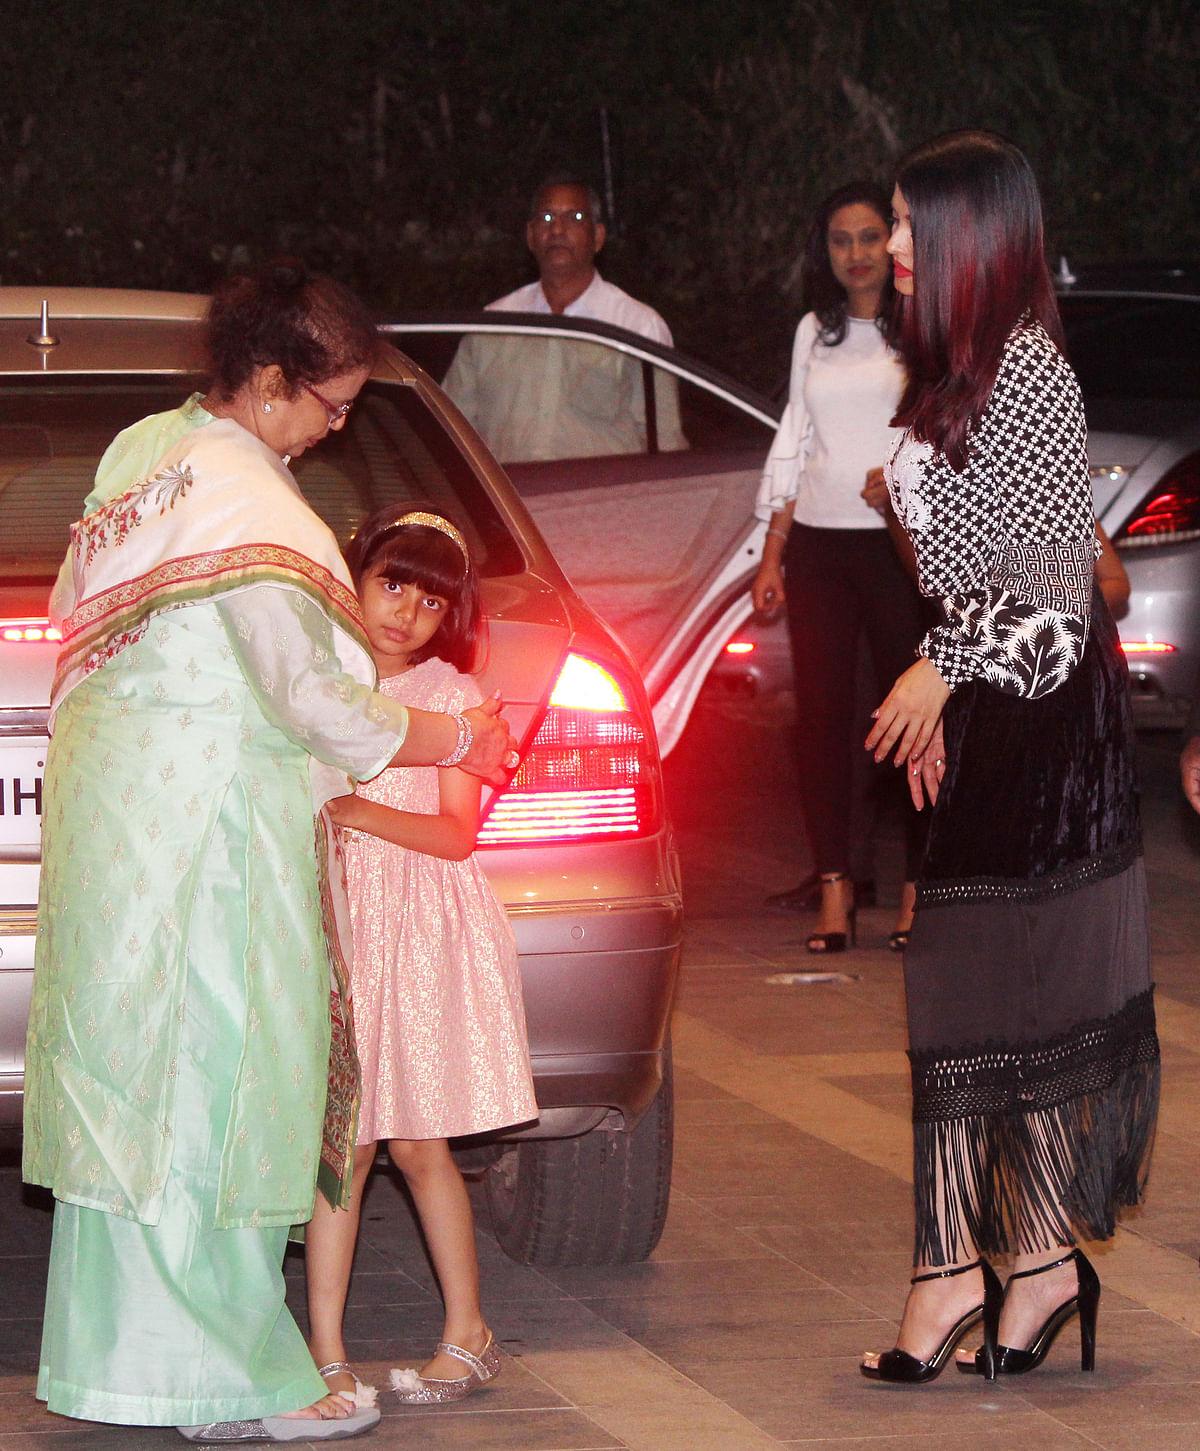 Aaradhya gives a goodbye hug to her grandmother.